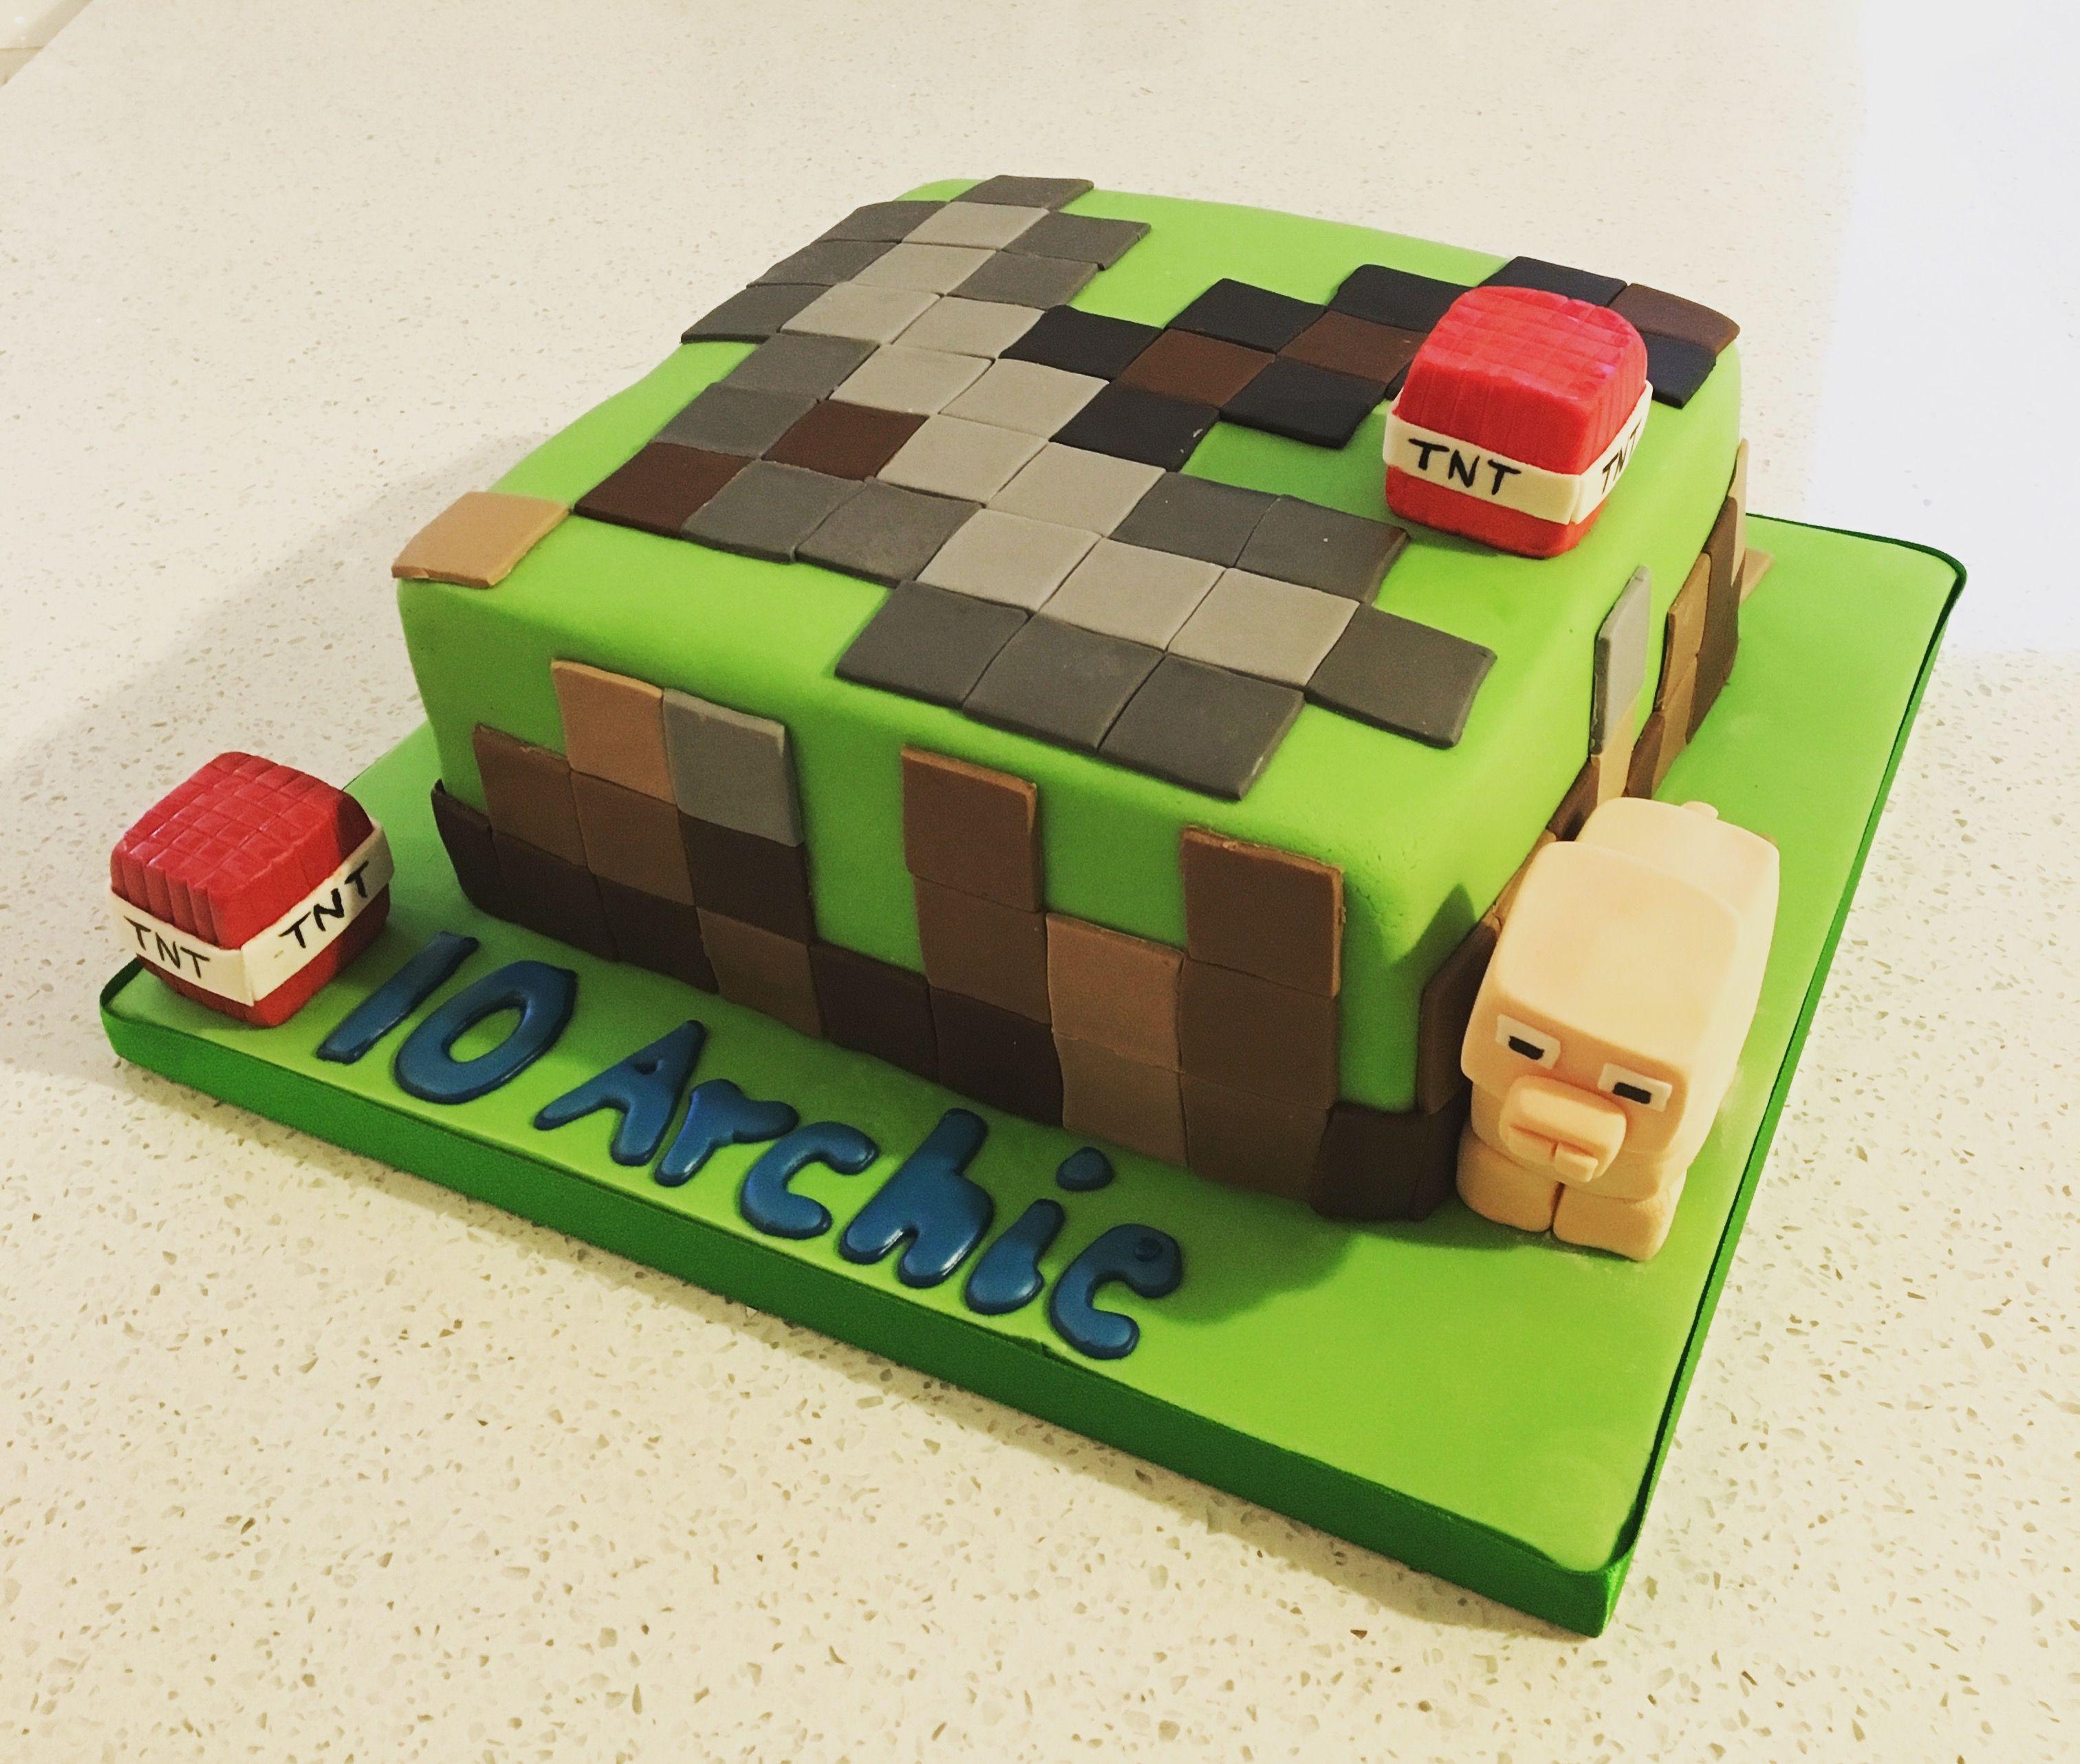 #minecraft #minecraftbirthdaycake by #croftandgreencakes @croftandgreencakes